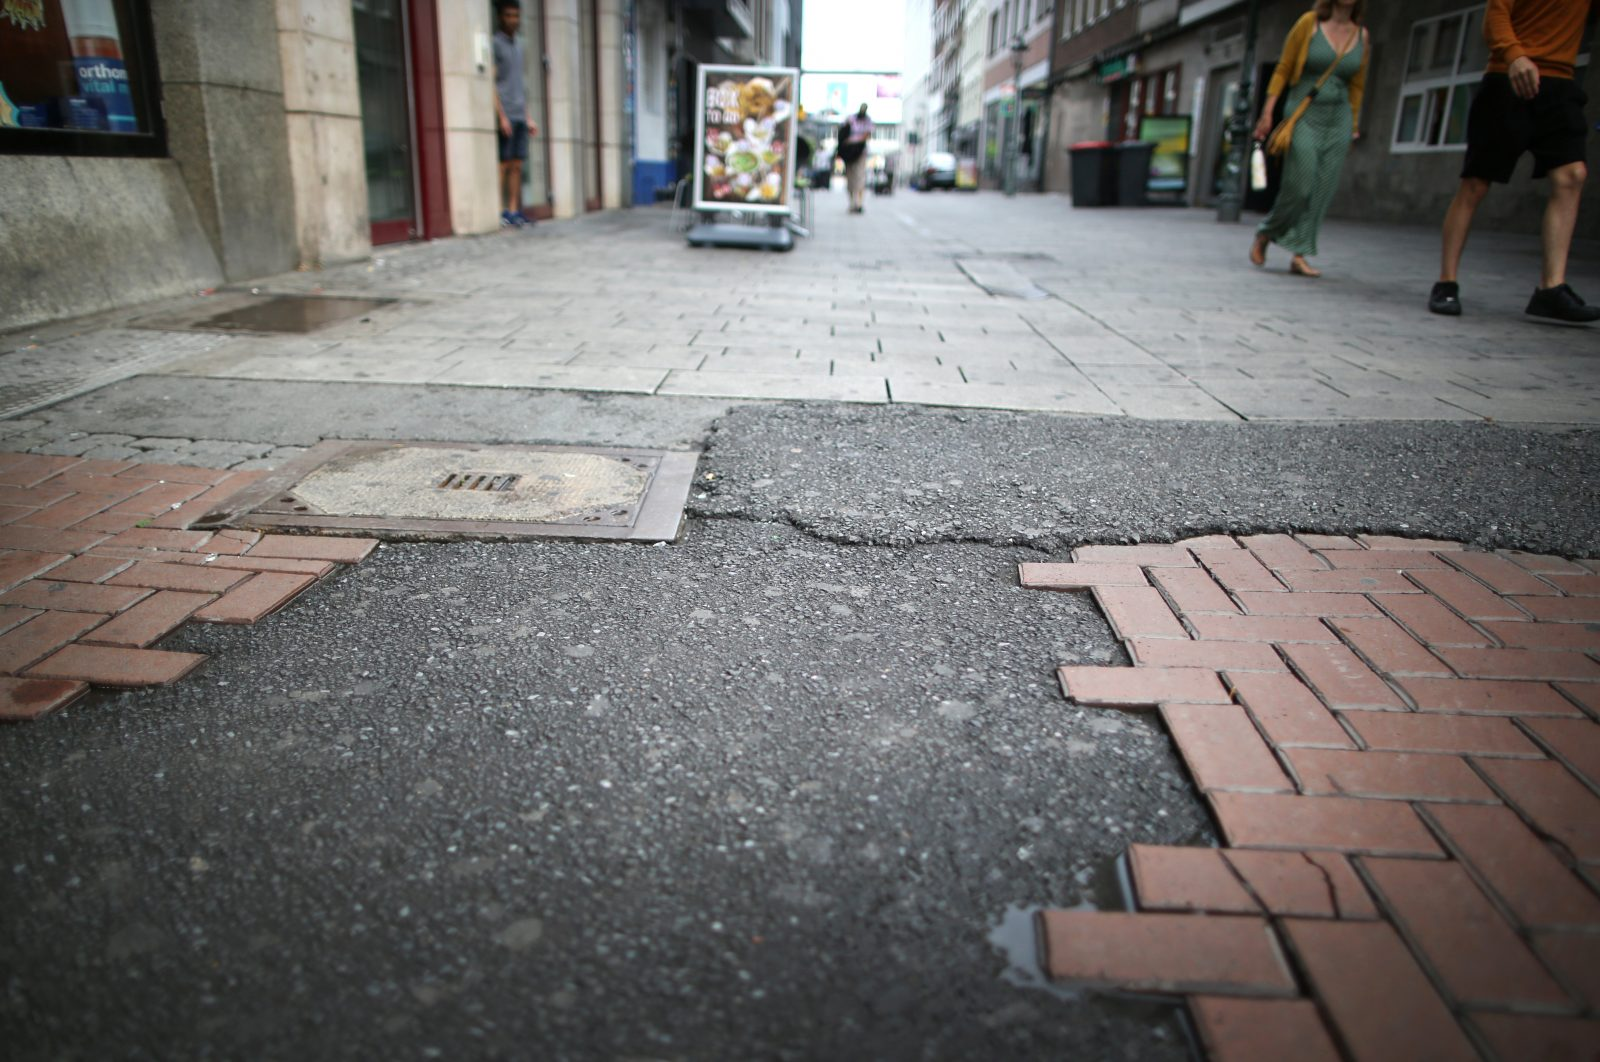 Düsseldorfer Altstadt: Polizei wegen Festnahme in der Kritik Fotos: picture alliance/Martin Gerten/dpa